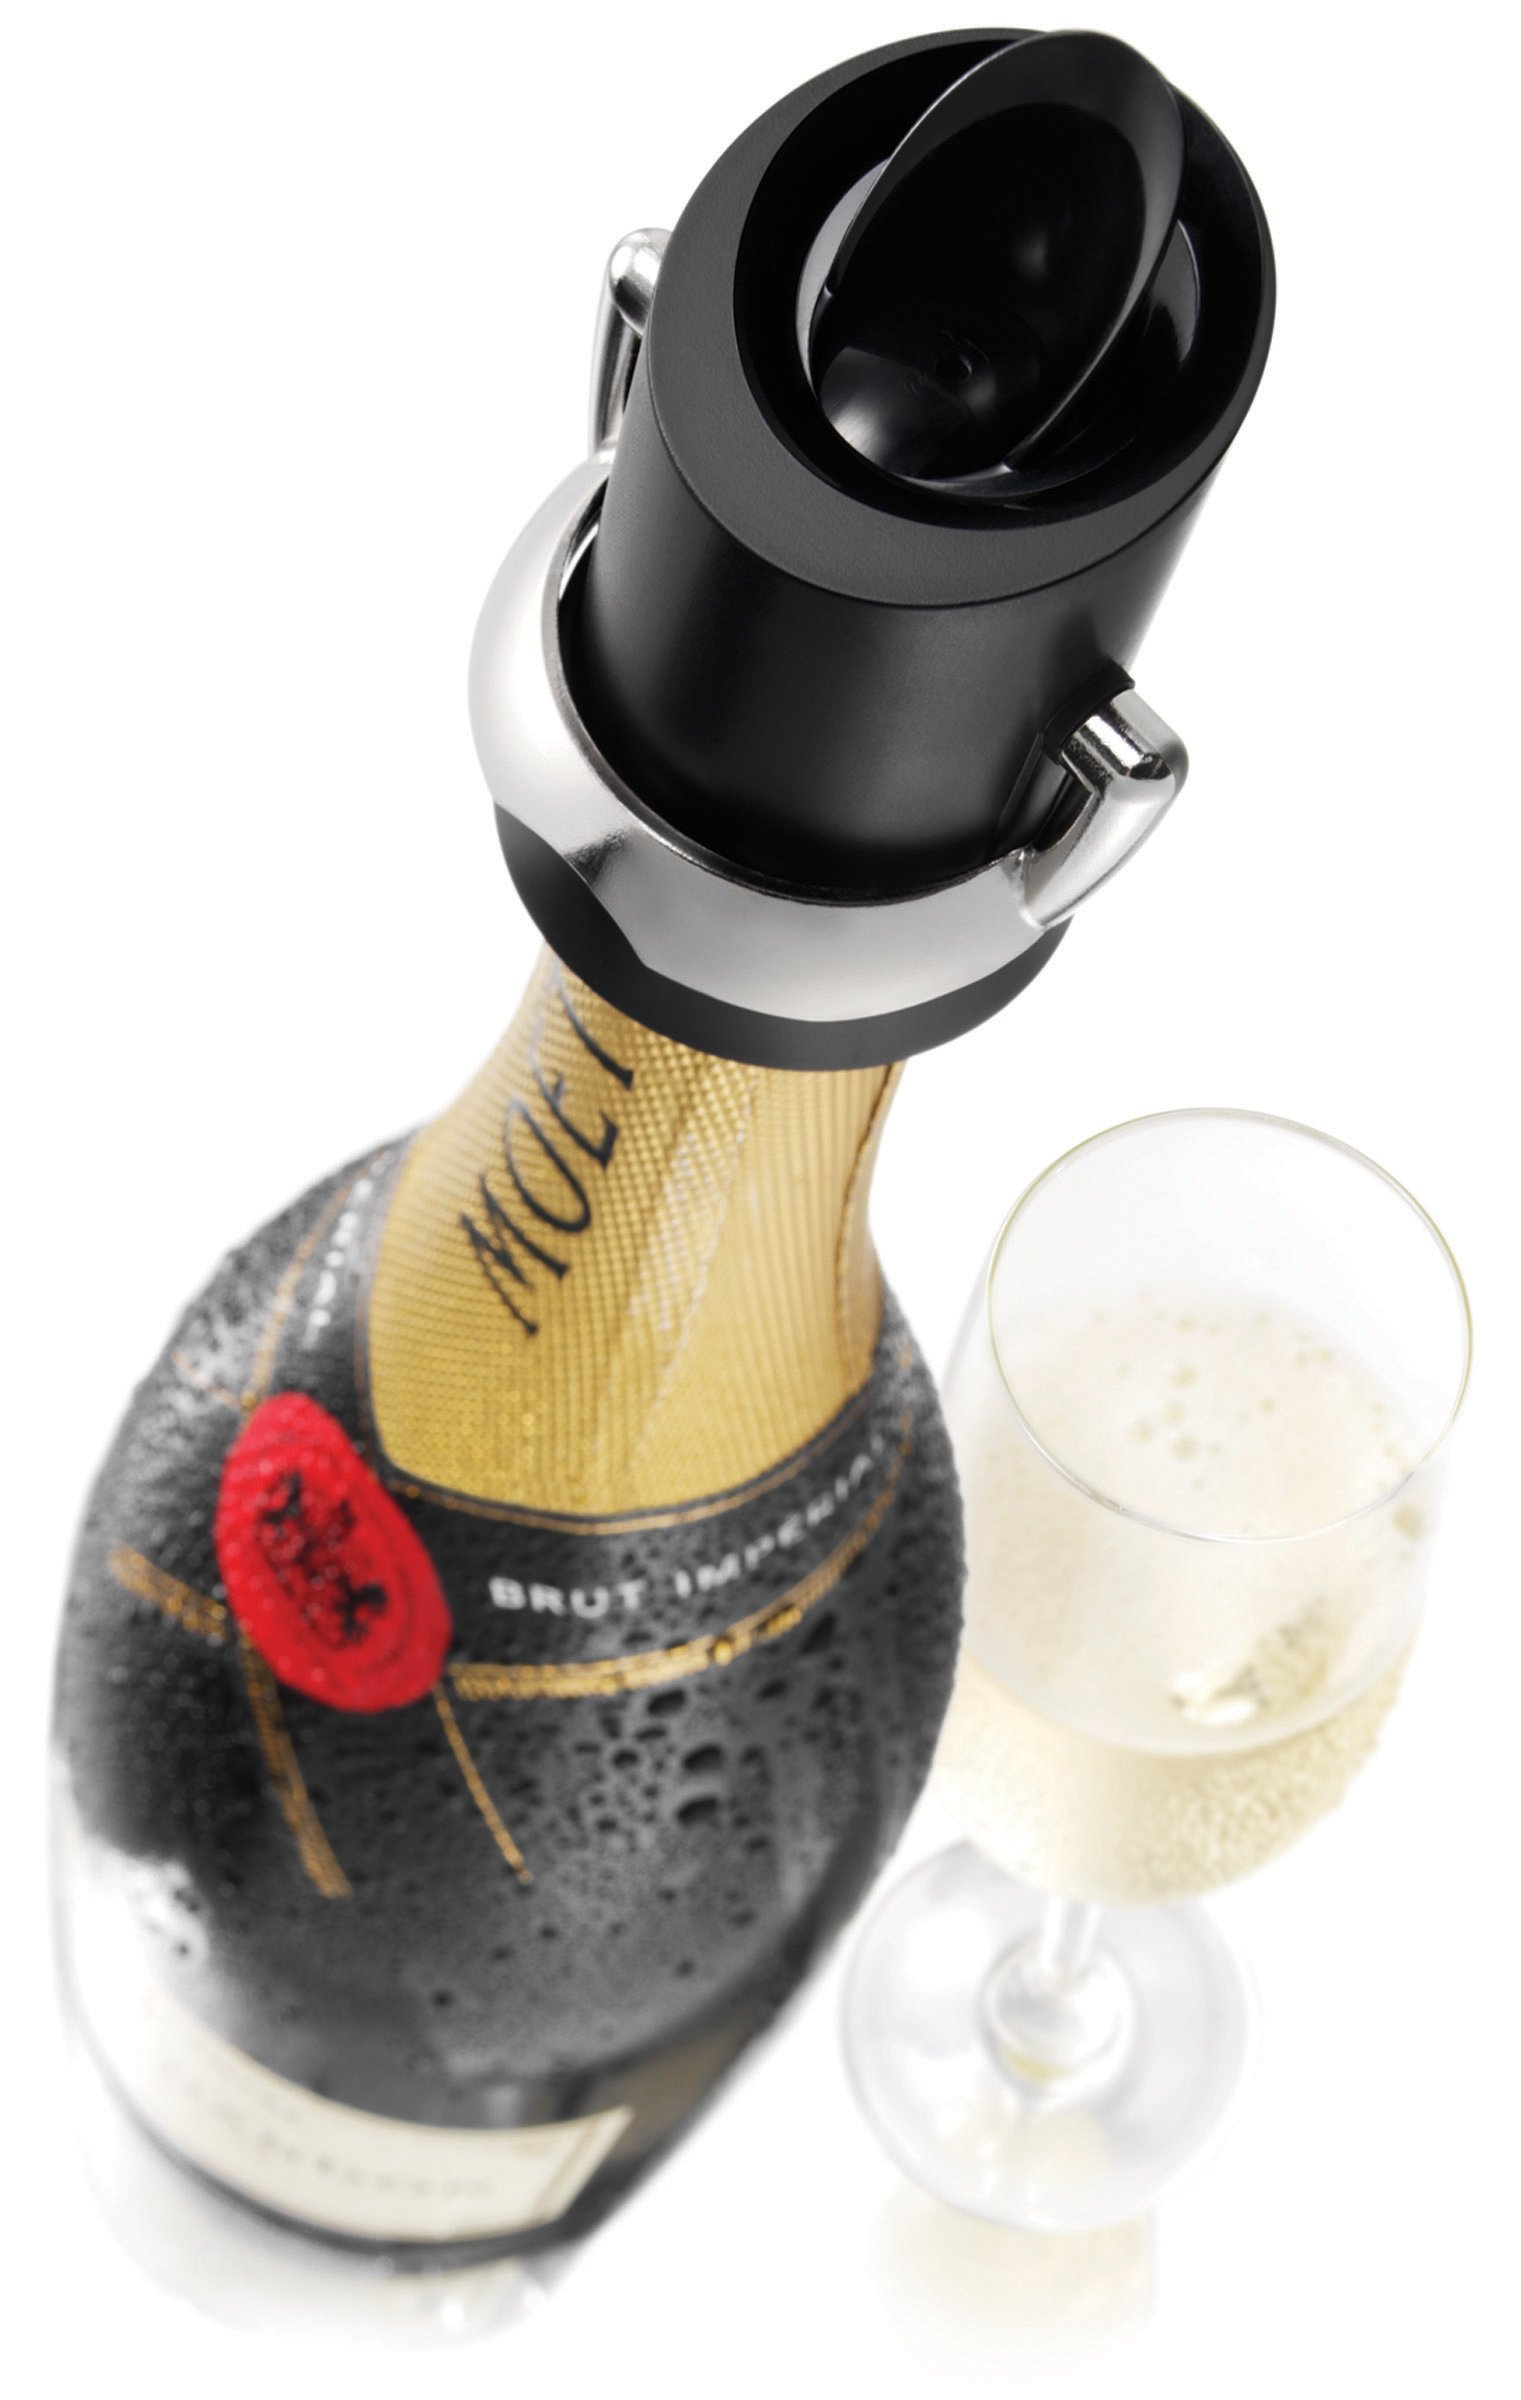 Vacu Vin Champagne Saver and Pourer by Vacu Vin